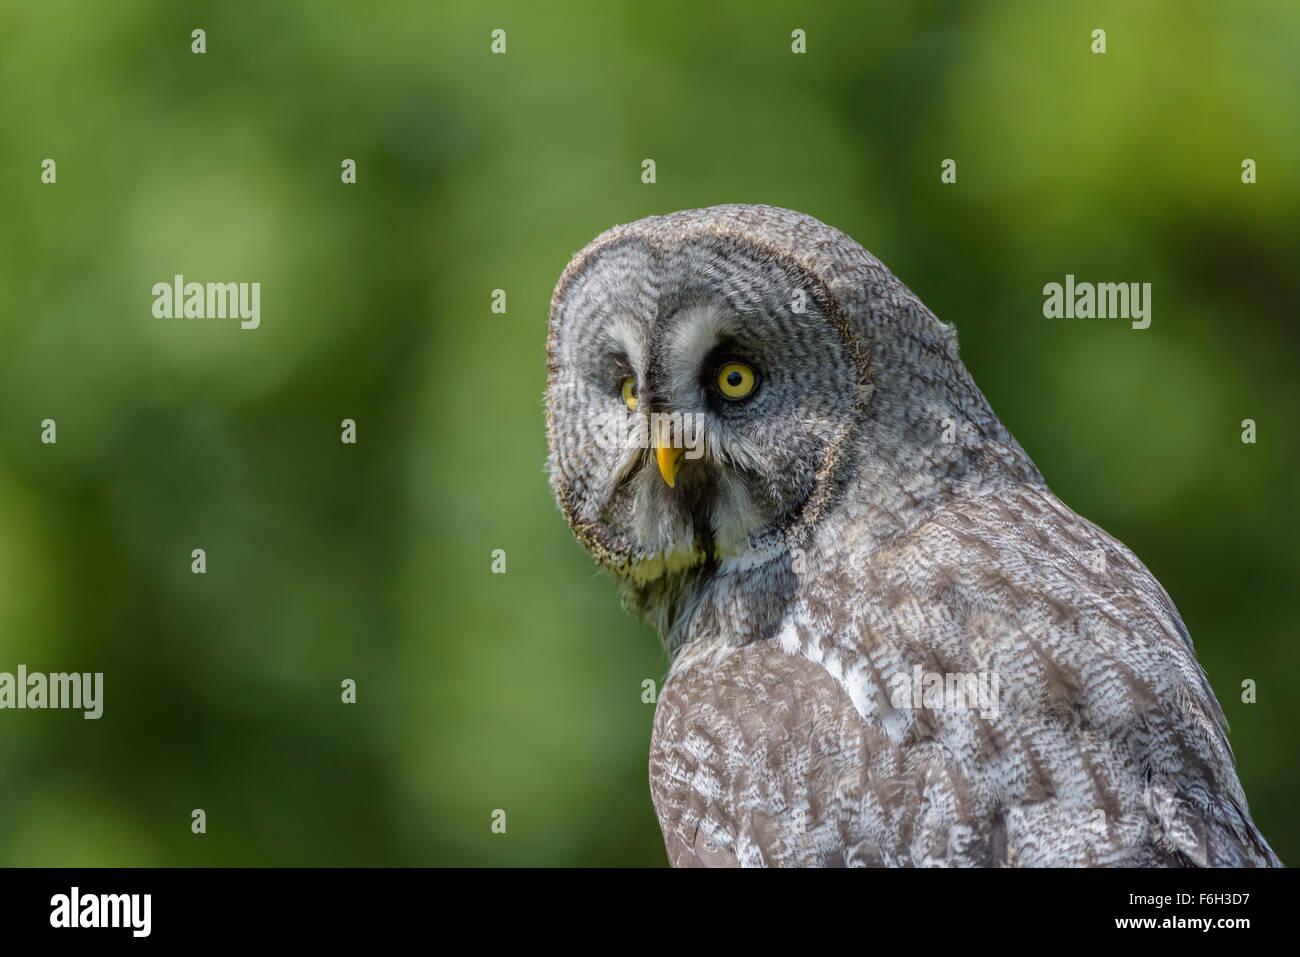 Bartkauz, Strix nebulosa, Great gray owl - Stock Image